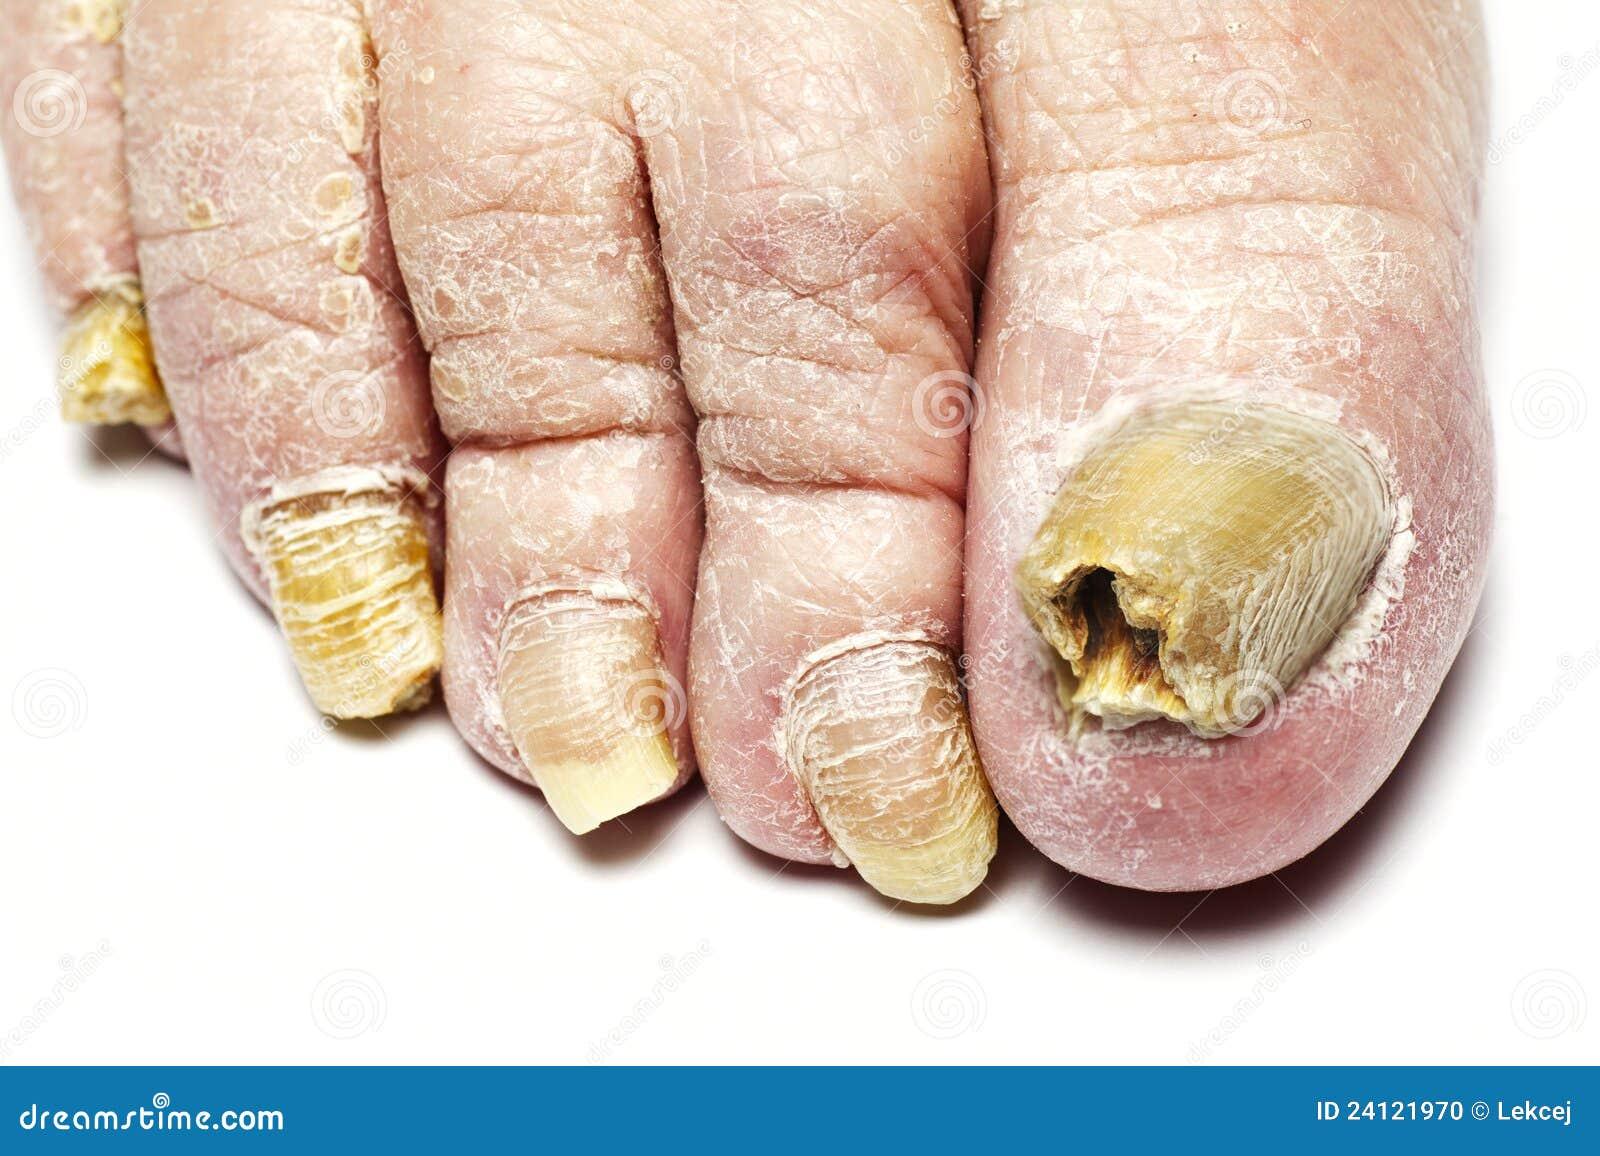 pilzartige nagel infektion stockfoto bild von medizin 24121970. Black Bedroom Furniture Sets. Home Design Ideas